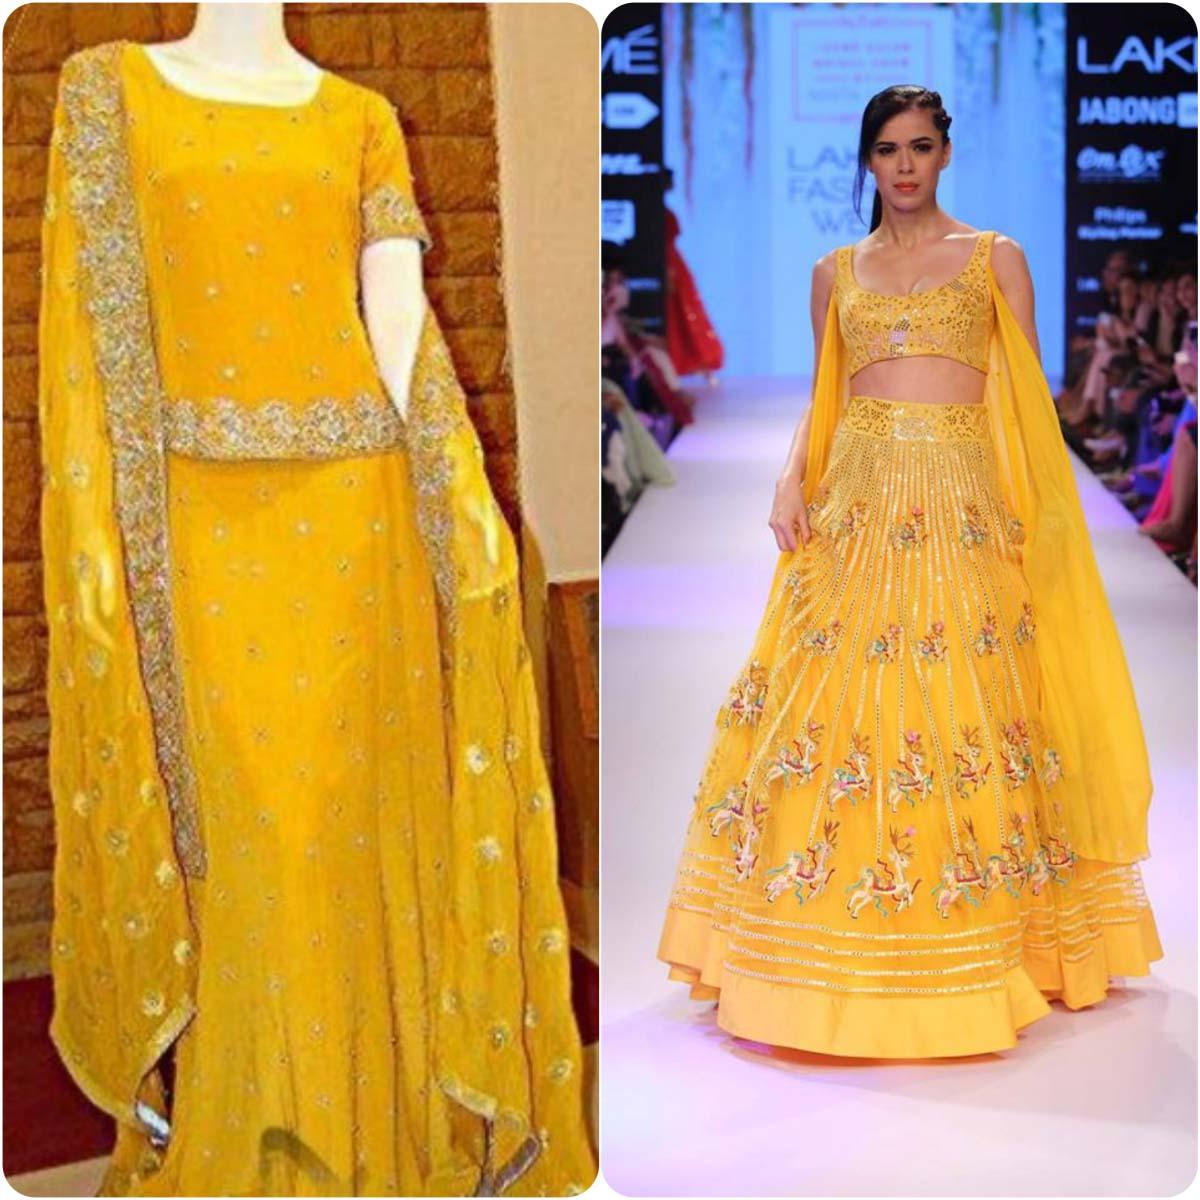 Beautiful Yellow Mehndi Dresses for Wedding Brides 2016-2017 (10)